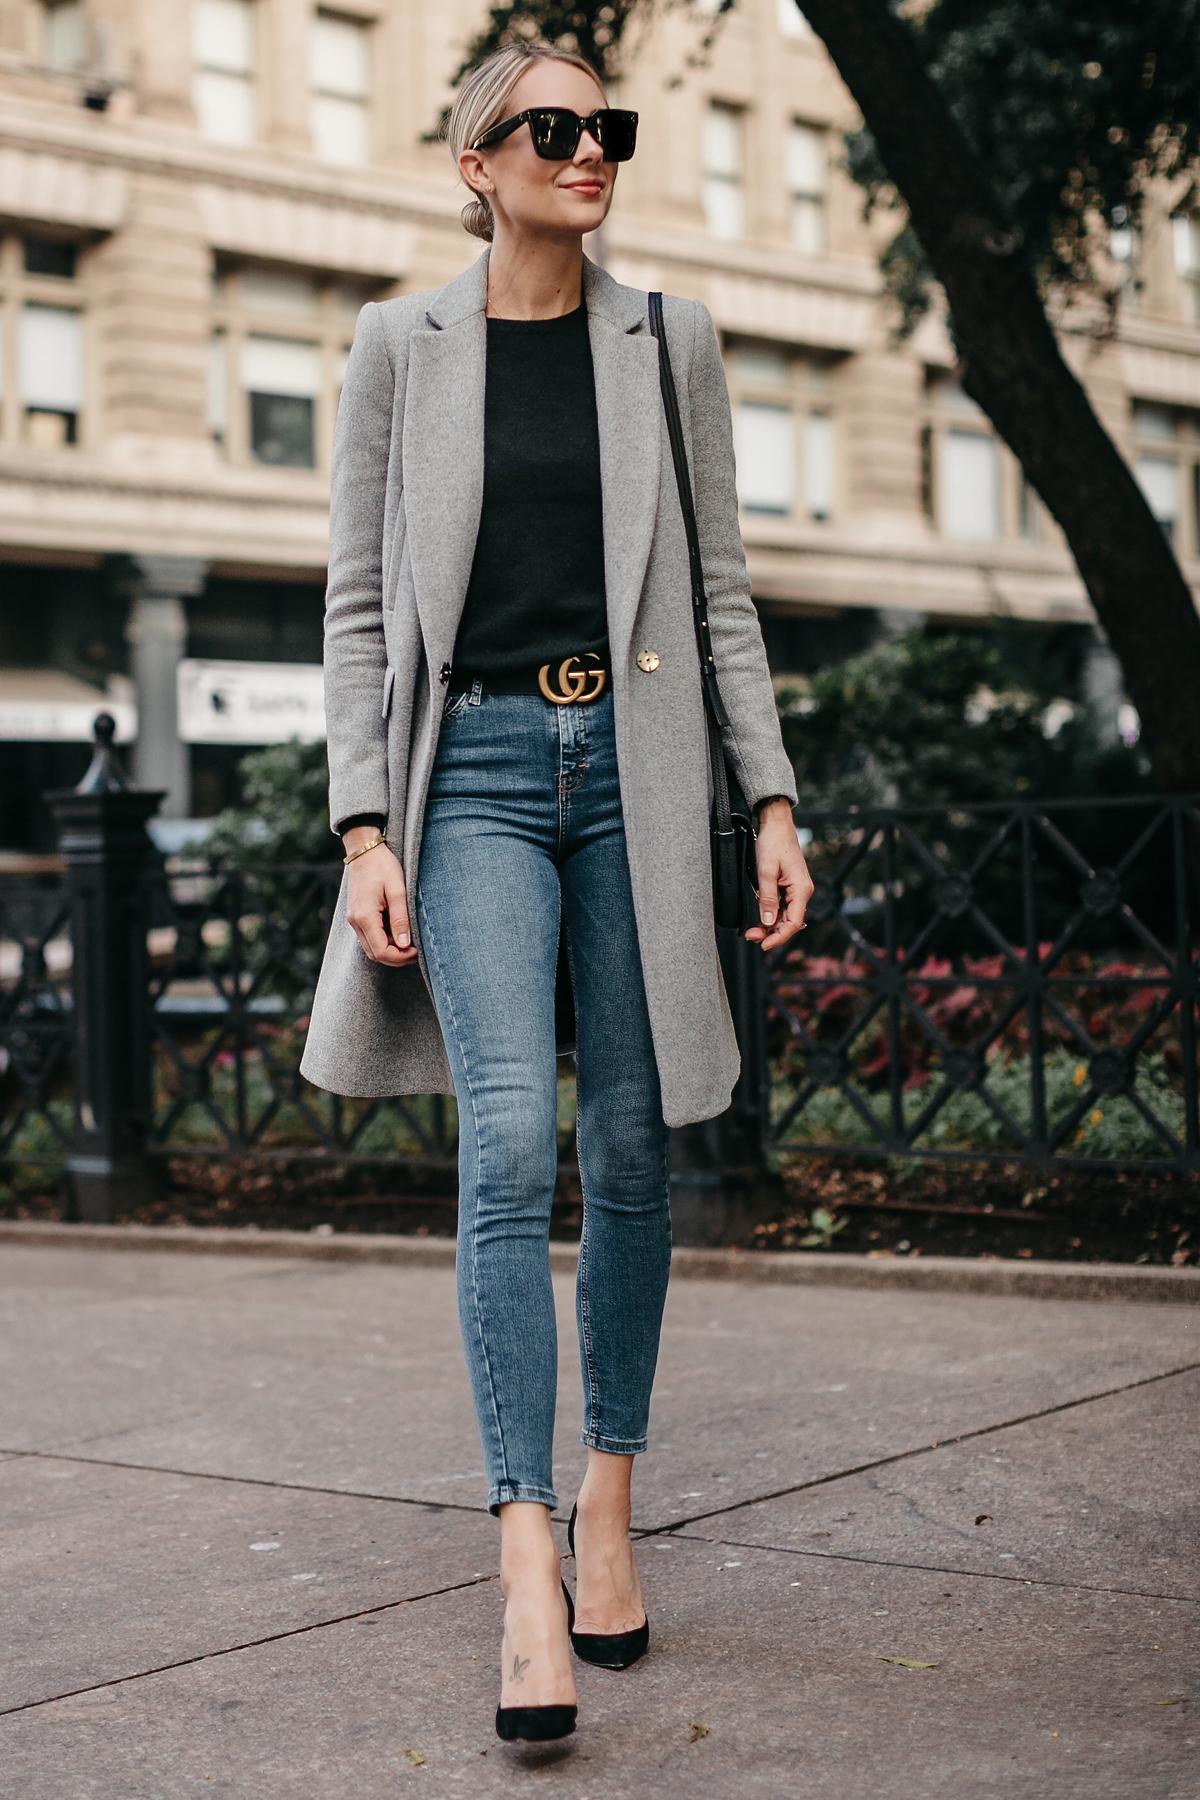 Blonde Woman Wearing Zara Grey Wool Coat Black Sweater Denim Skinny Jeans Gucci Marmont Belt Christian Louboutin Black Pumps Fashion Jackson Dallas Blogger Fashion Blogger Street Style